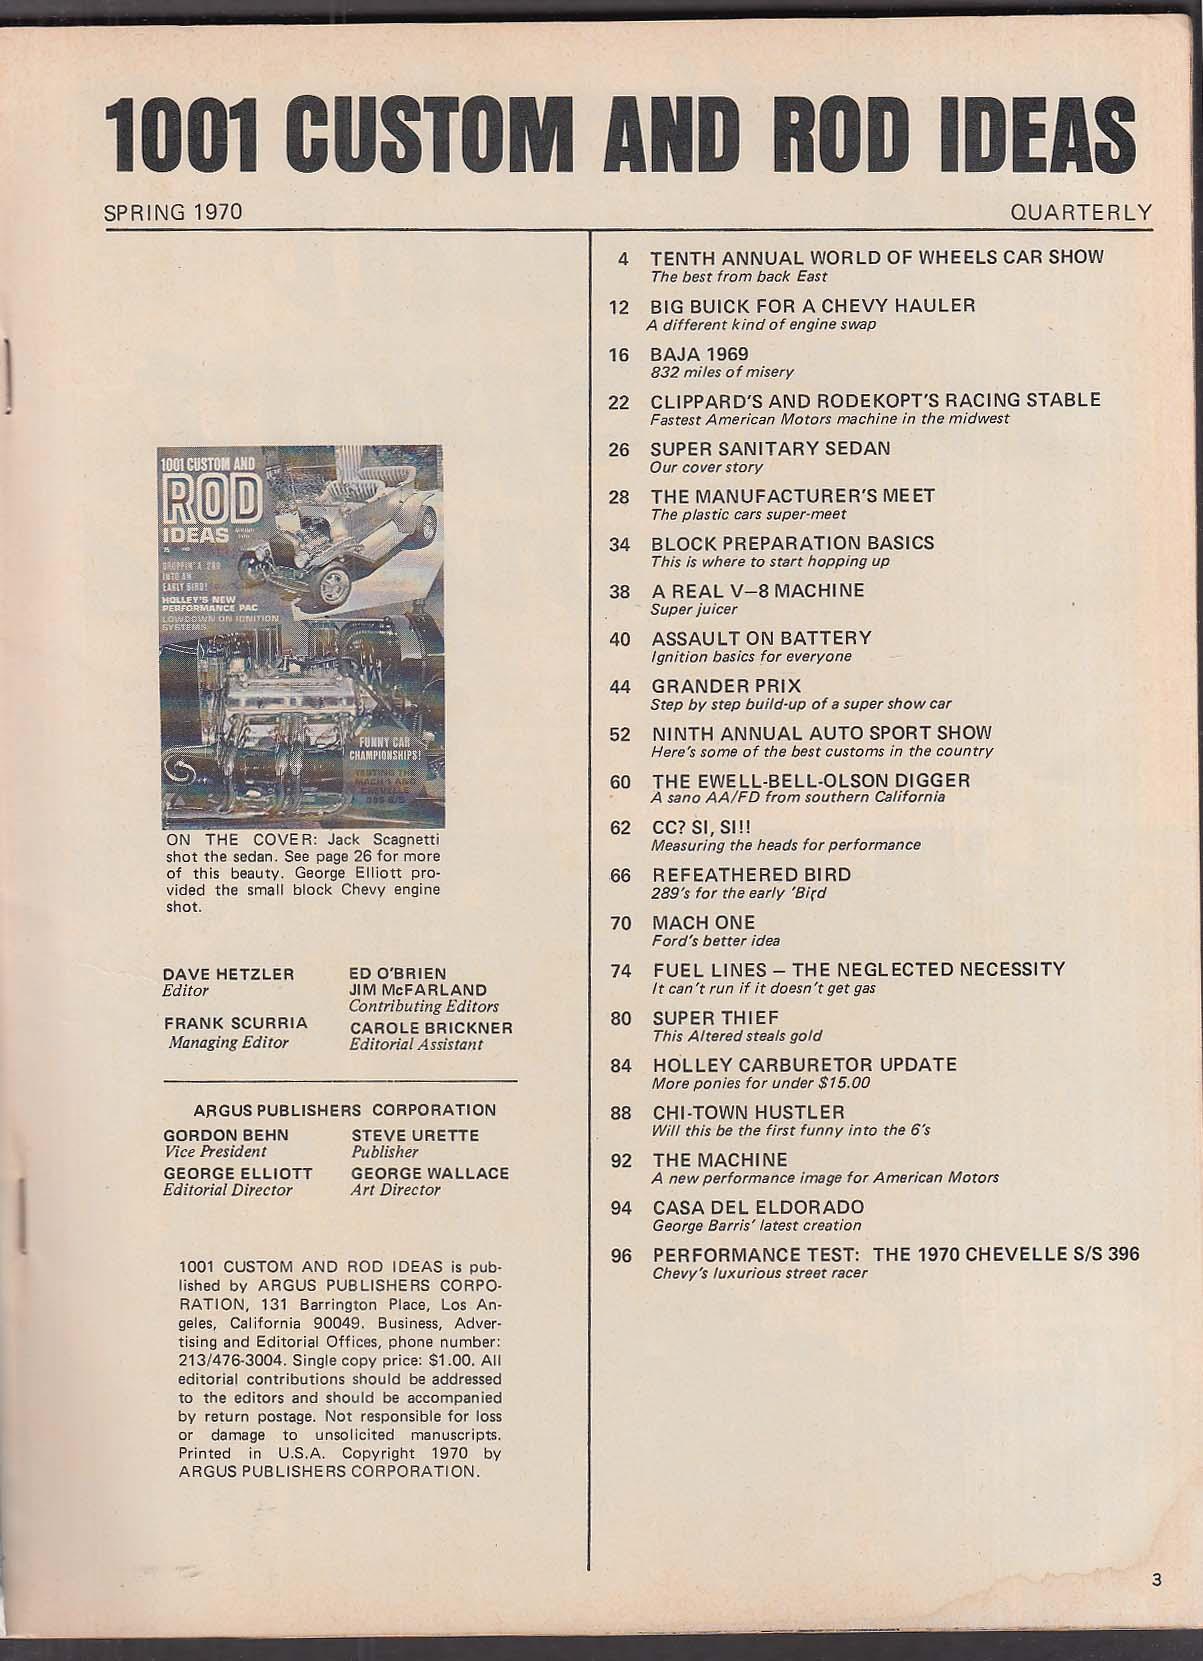 1001 CUSTOM & ROD IDEAS Mustang Mach I Chevelle SS396 Spring 1970